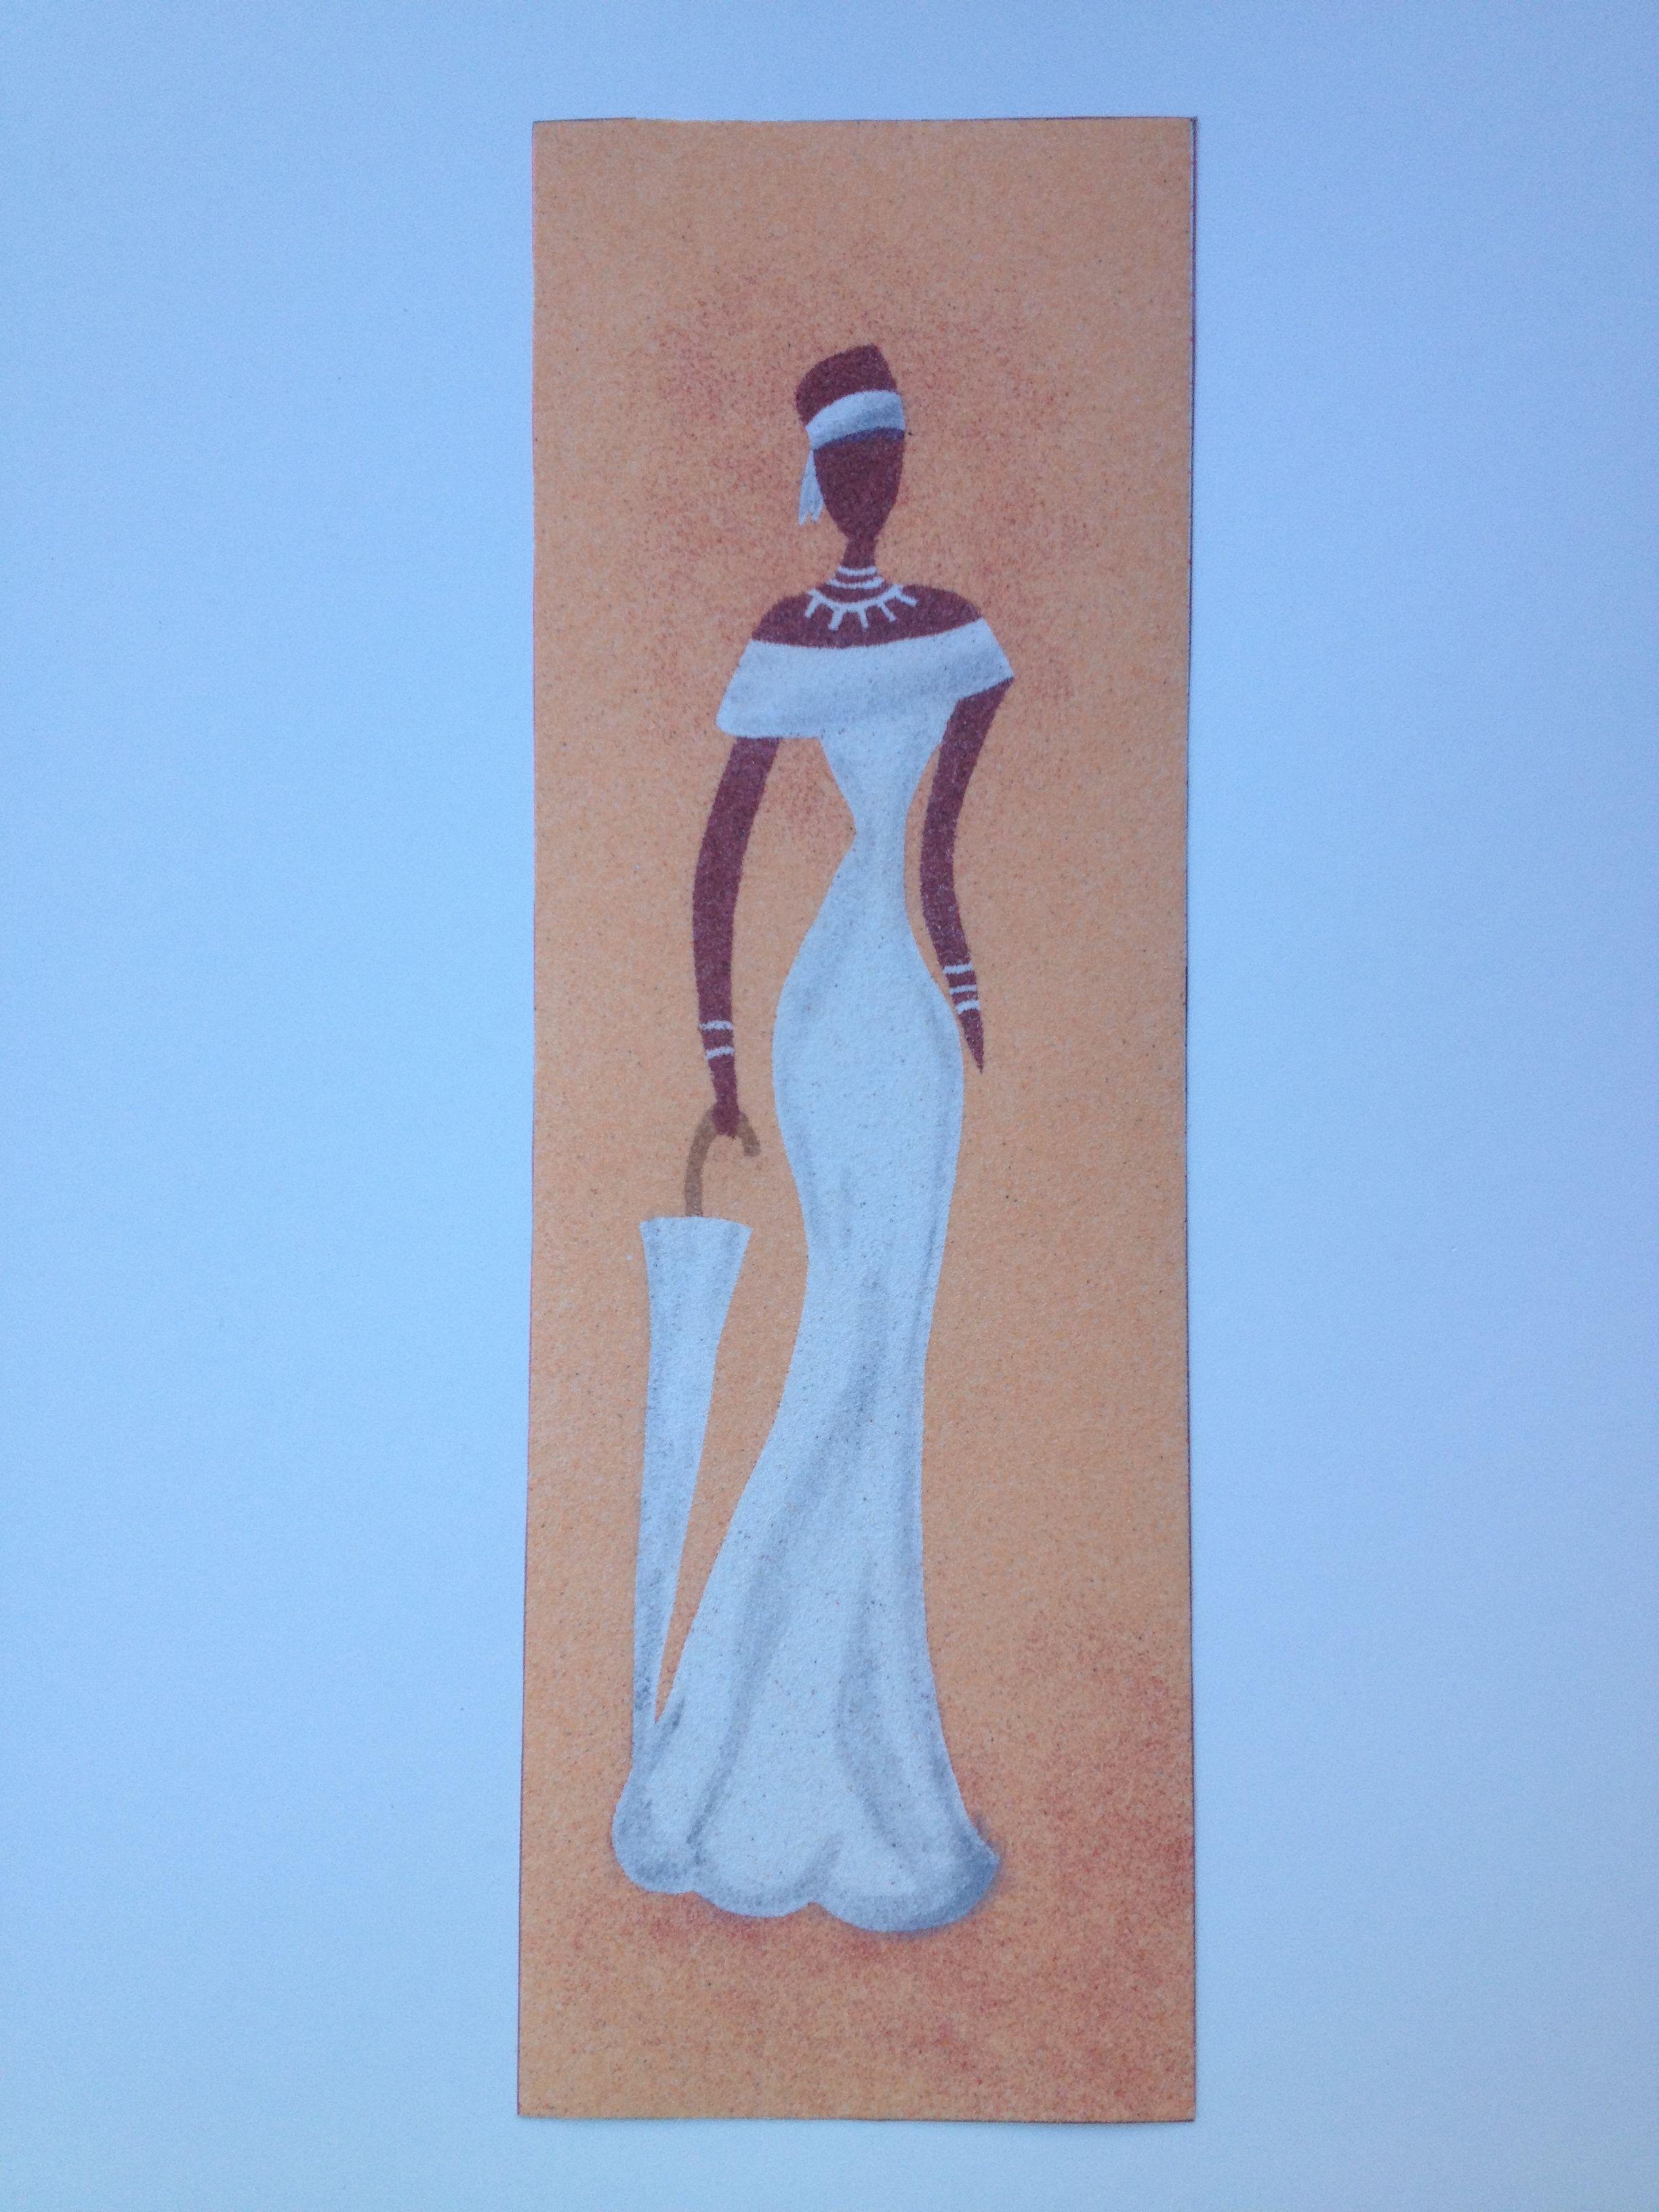 Lamina de polyphan, donde se ha elaborado un precioso dibujo, con ...